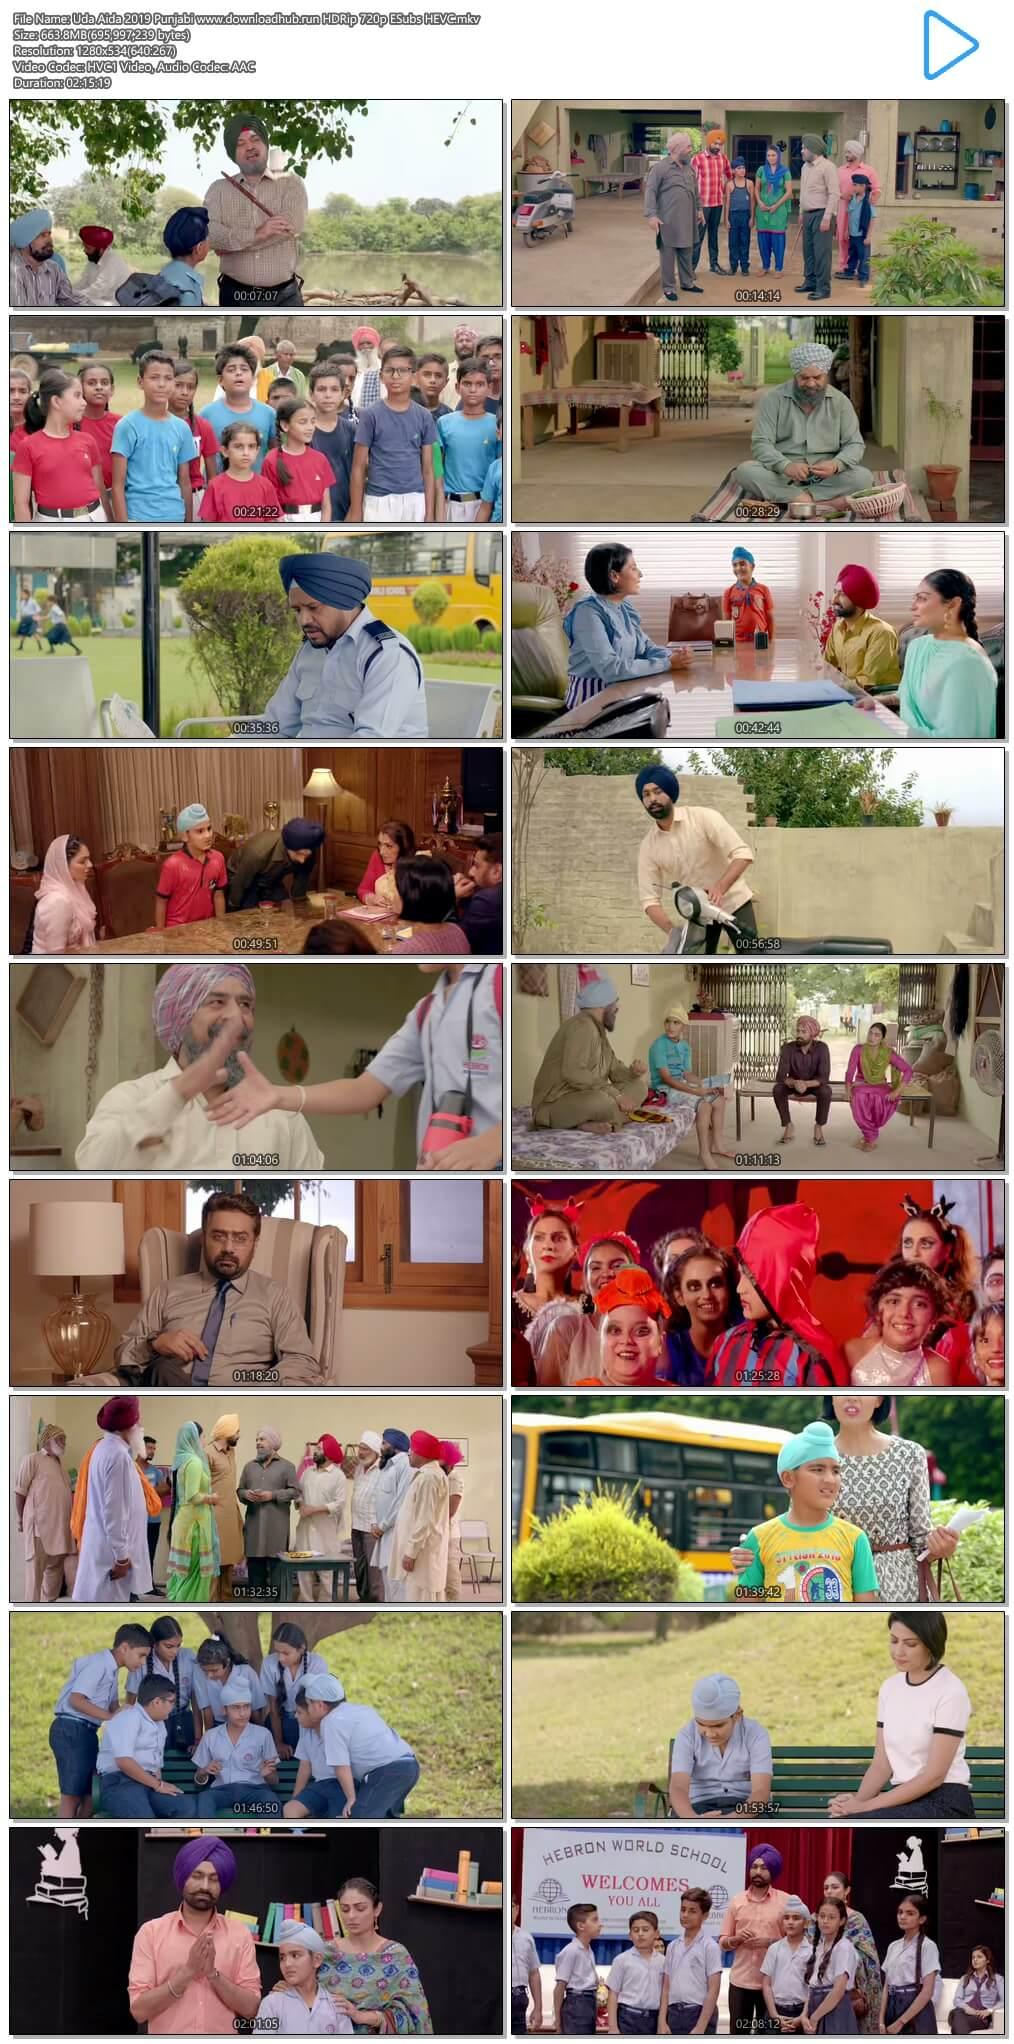 Uda Aida 2019 Punjabi 650MB HDRip 720p ESubs HEVC